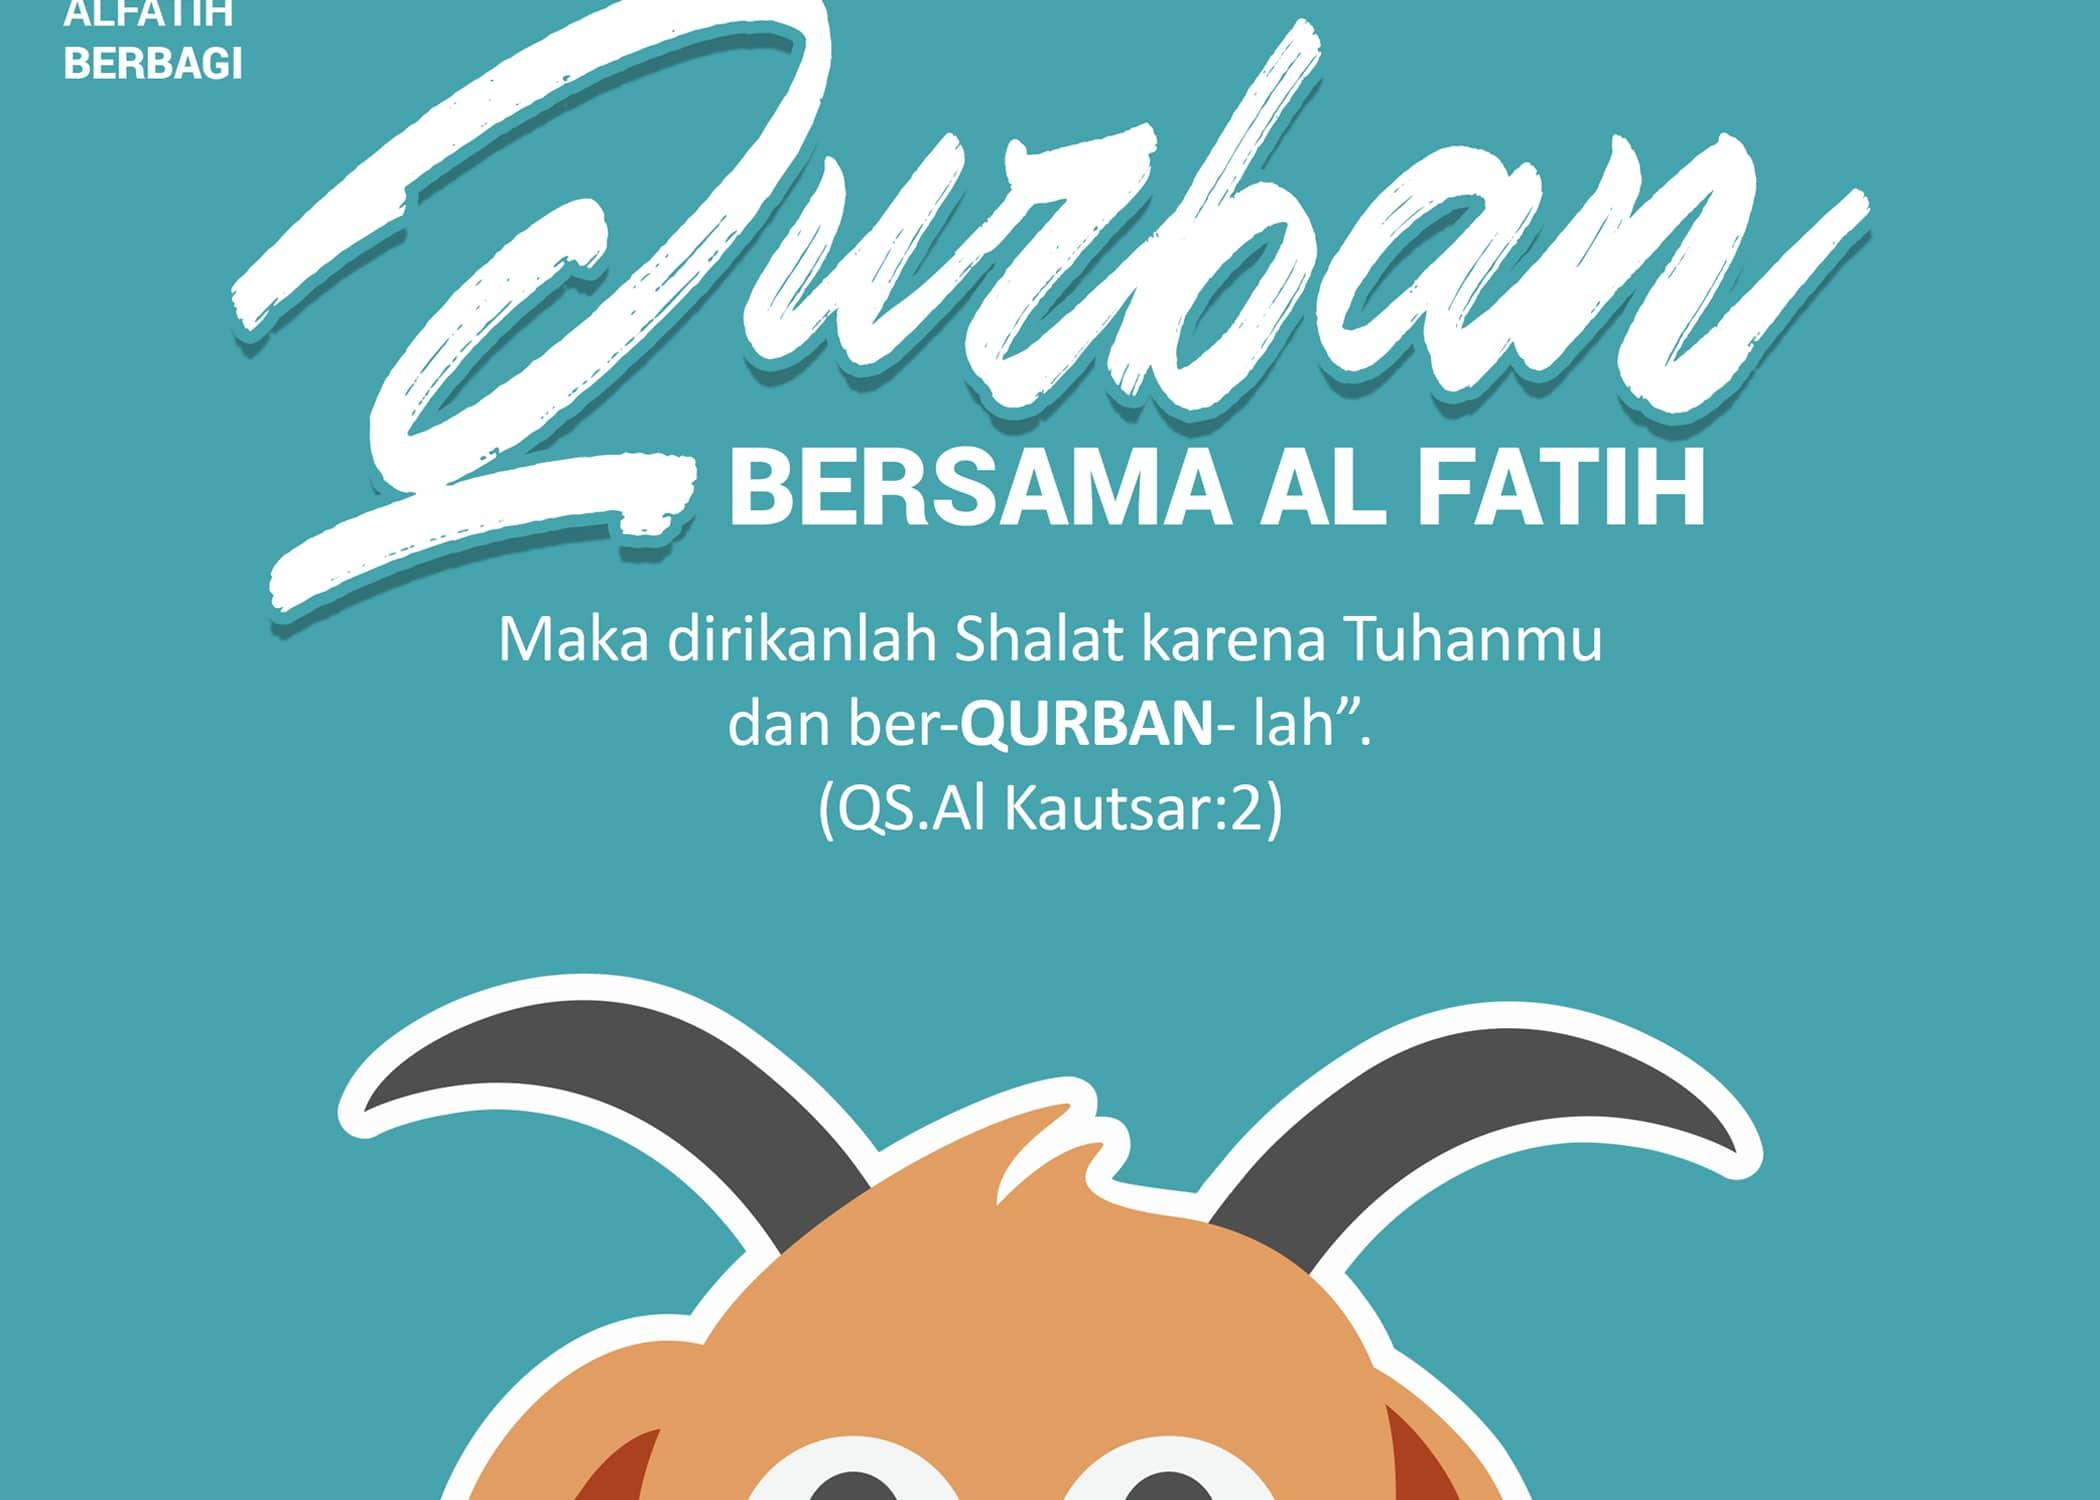 Al FATIH Berbagi Qurban